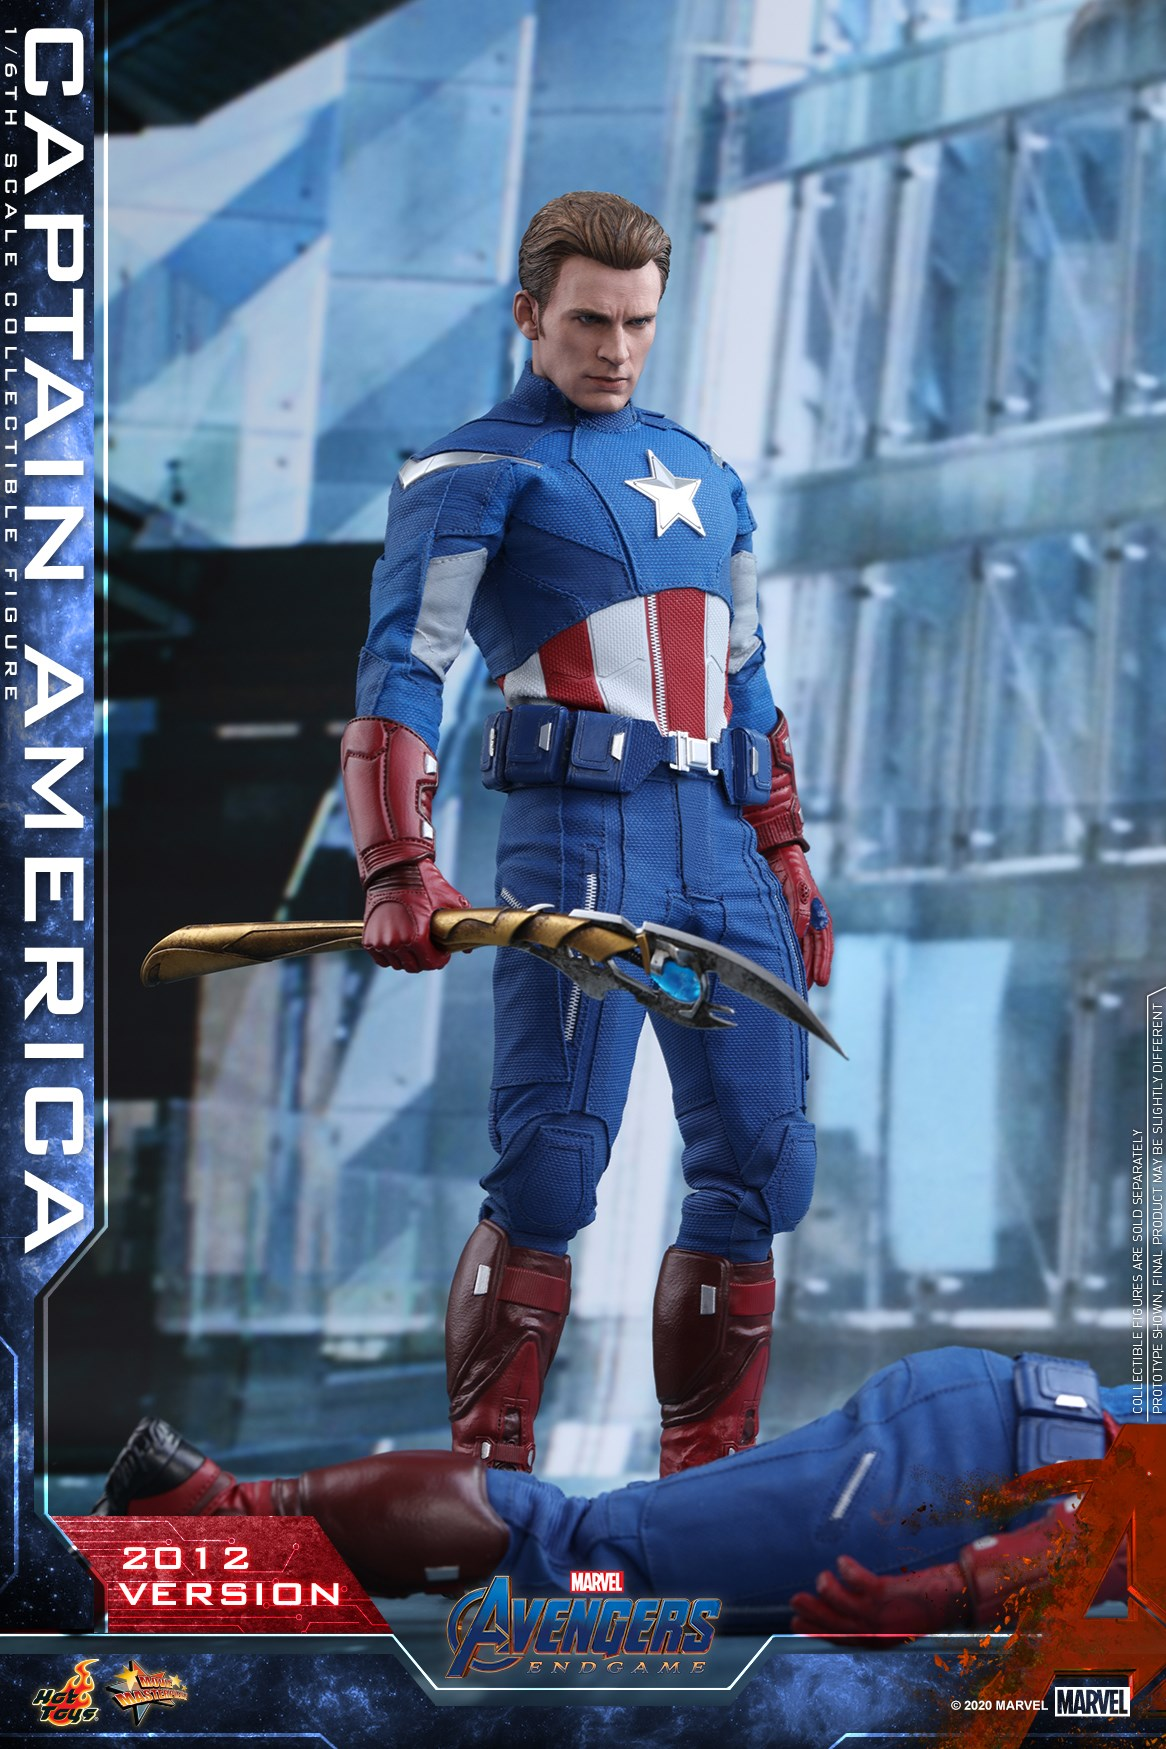 Avengers: Koniec gry - figurka Kapitan Ameryka